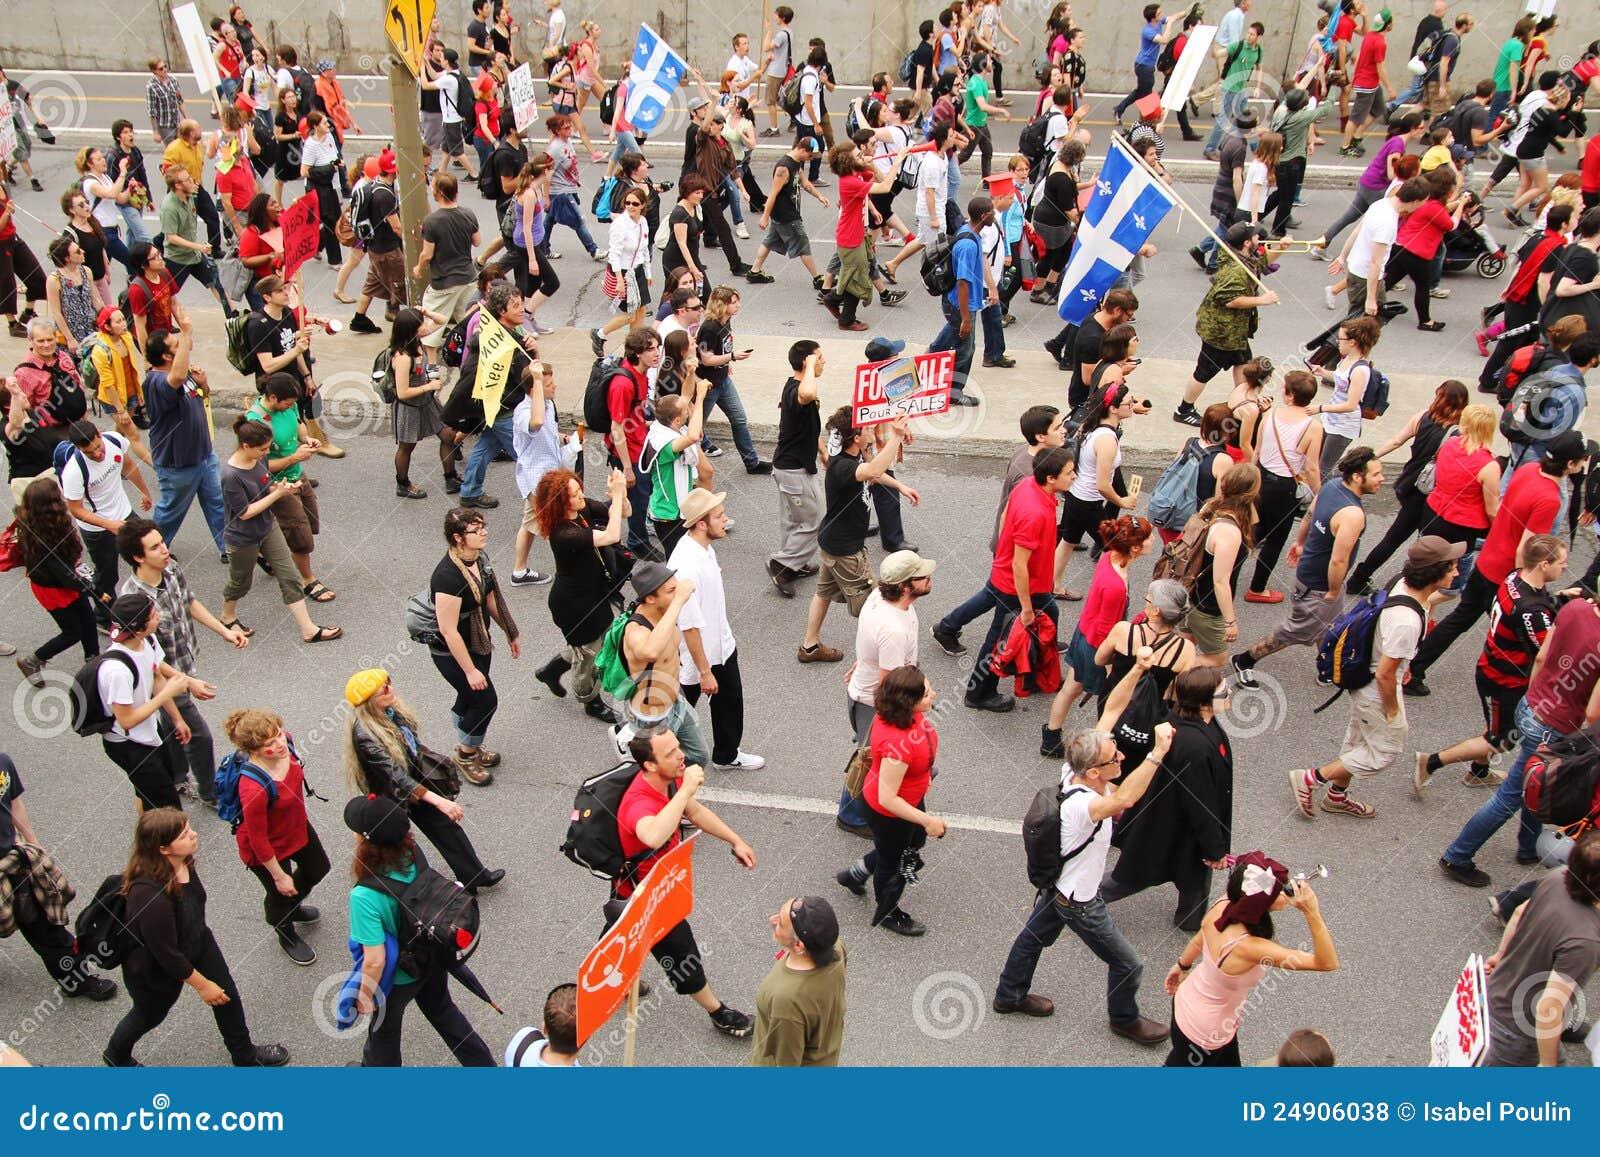 Demonstration in Montreal street